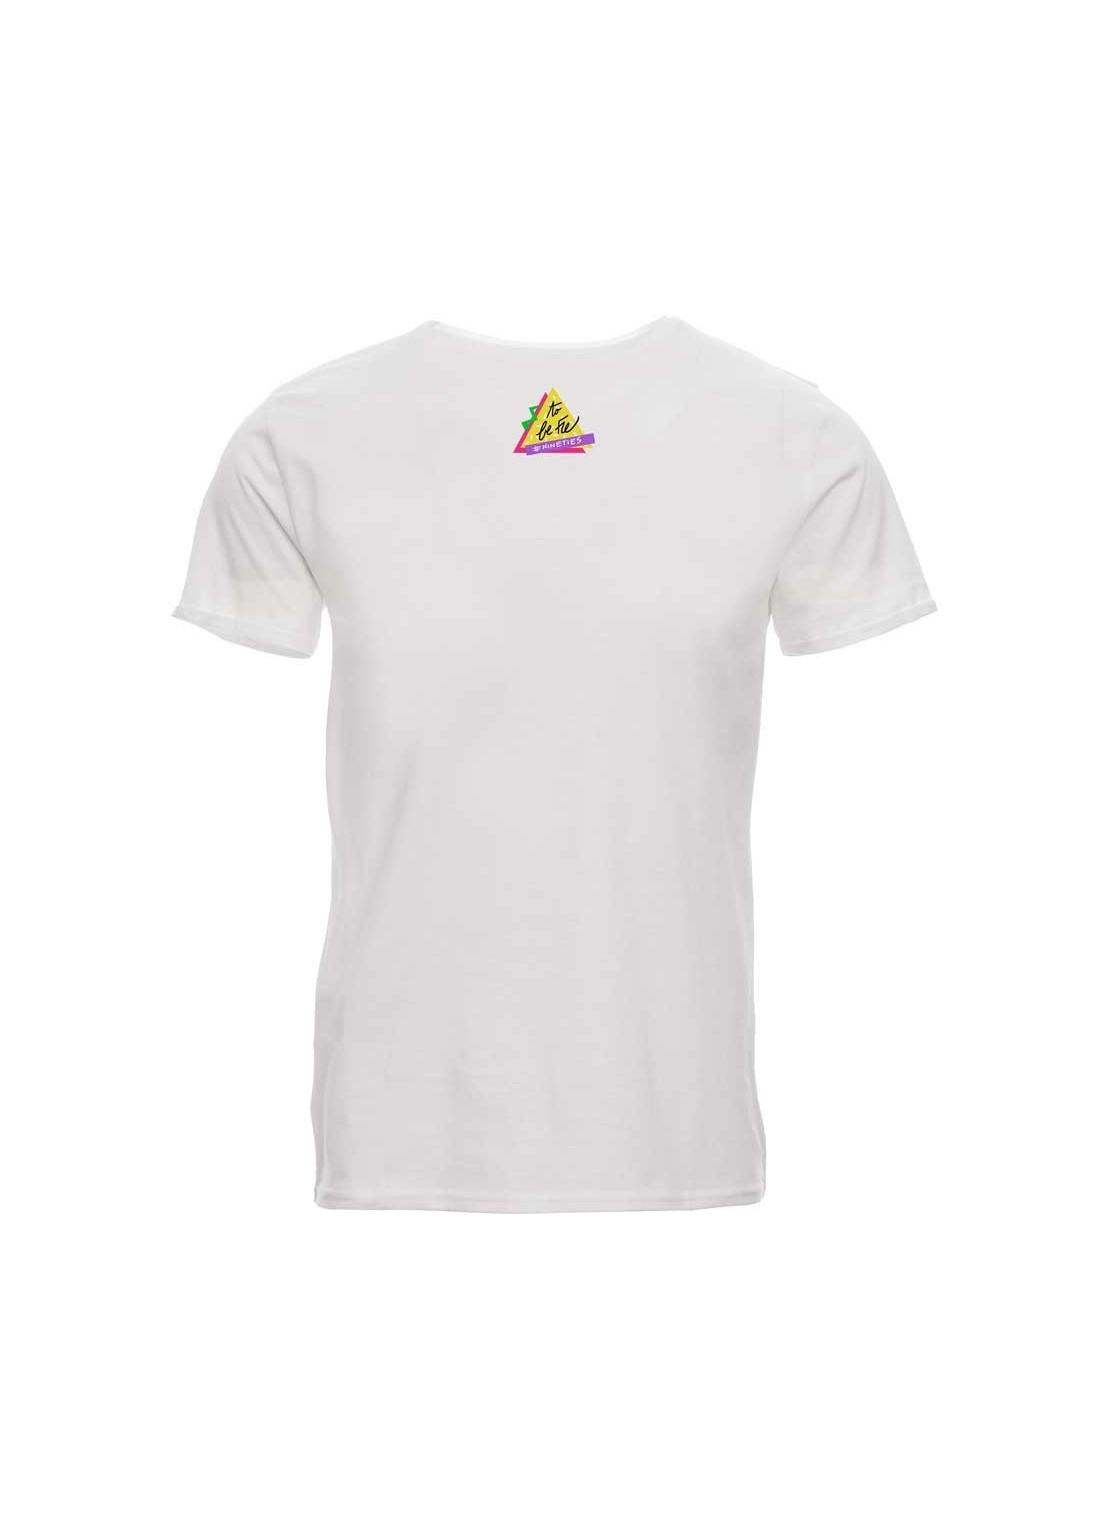 "T-shirt ""La verità"" - unisex bianca"